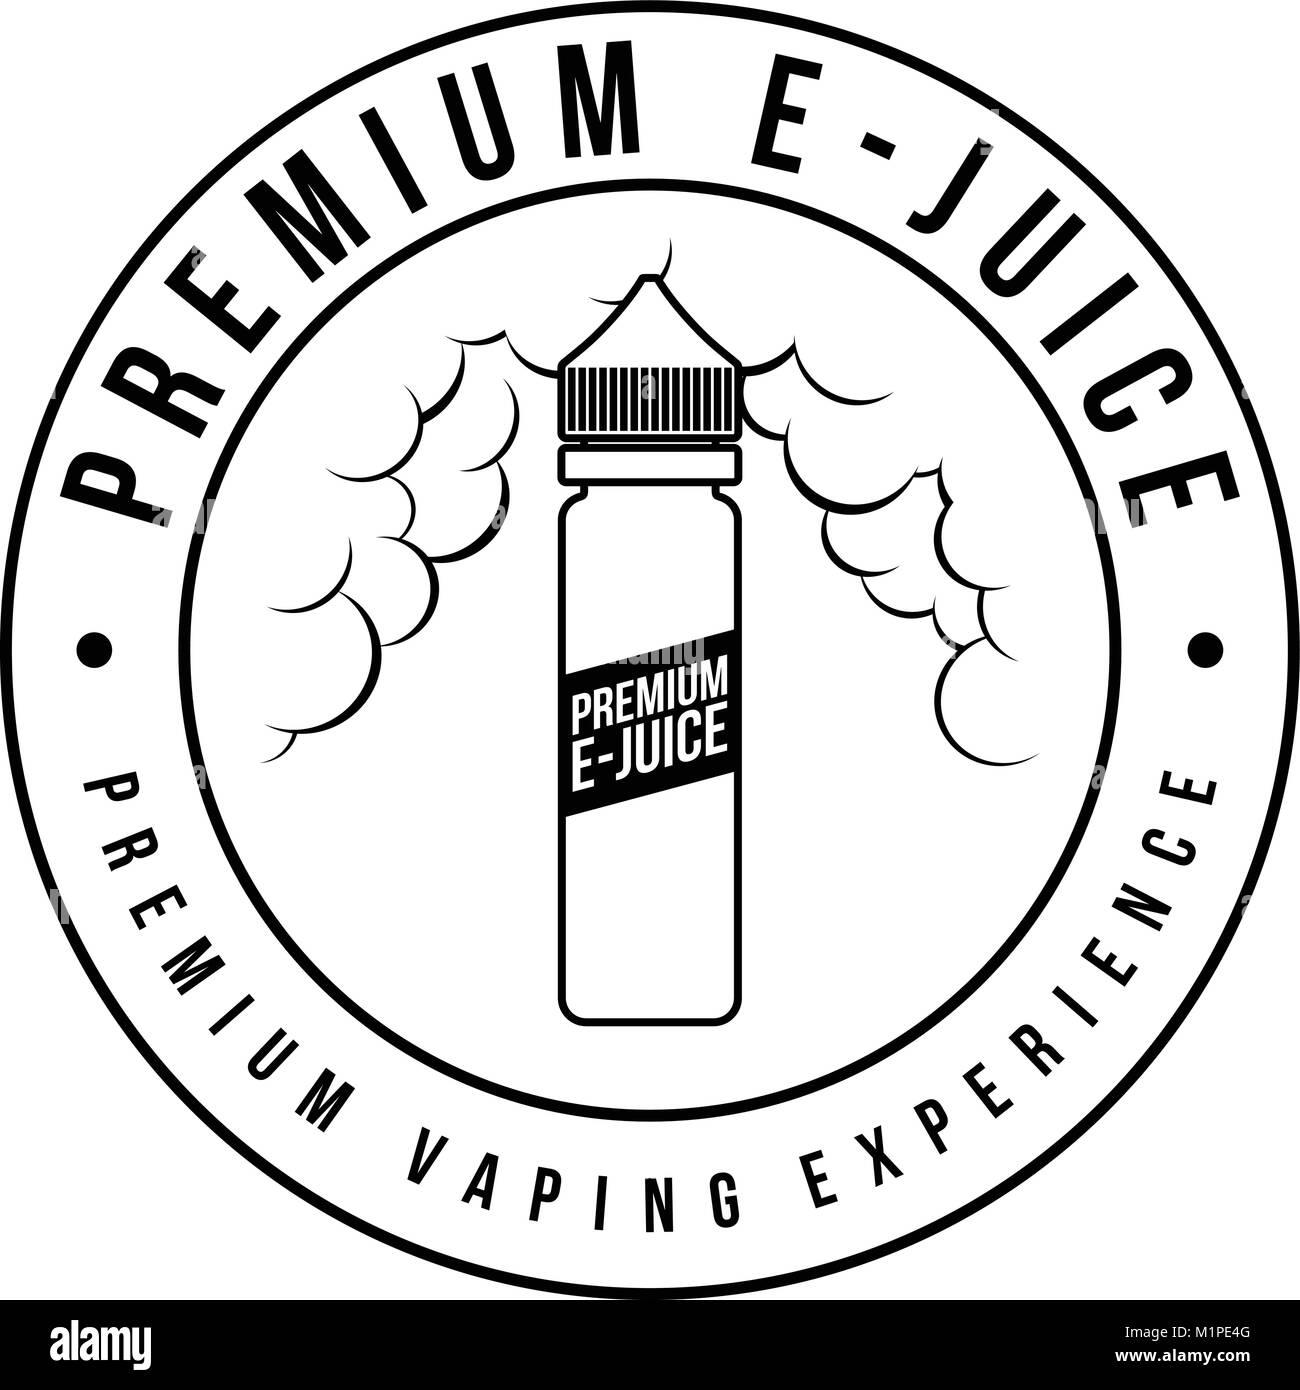 personal vaporizer e-cigarette e-juice liquid label badge vector art - Stock Image